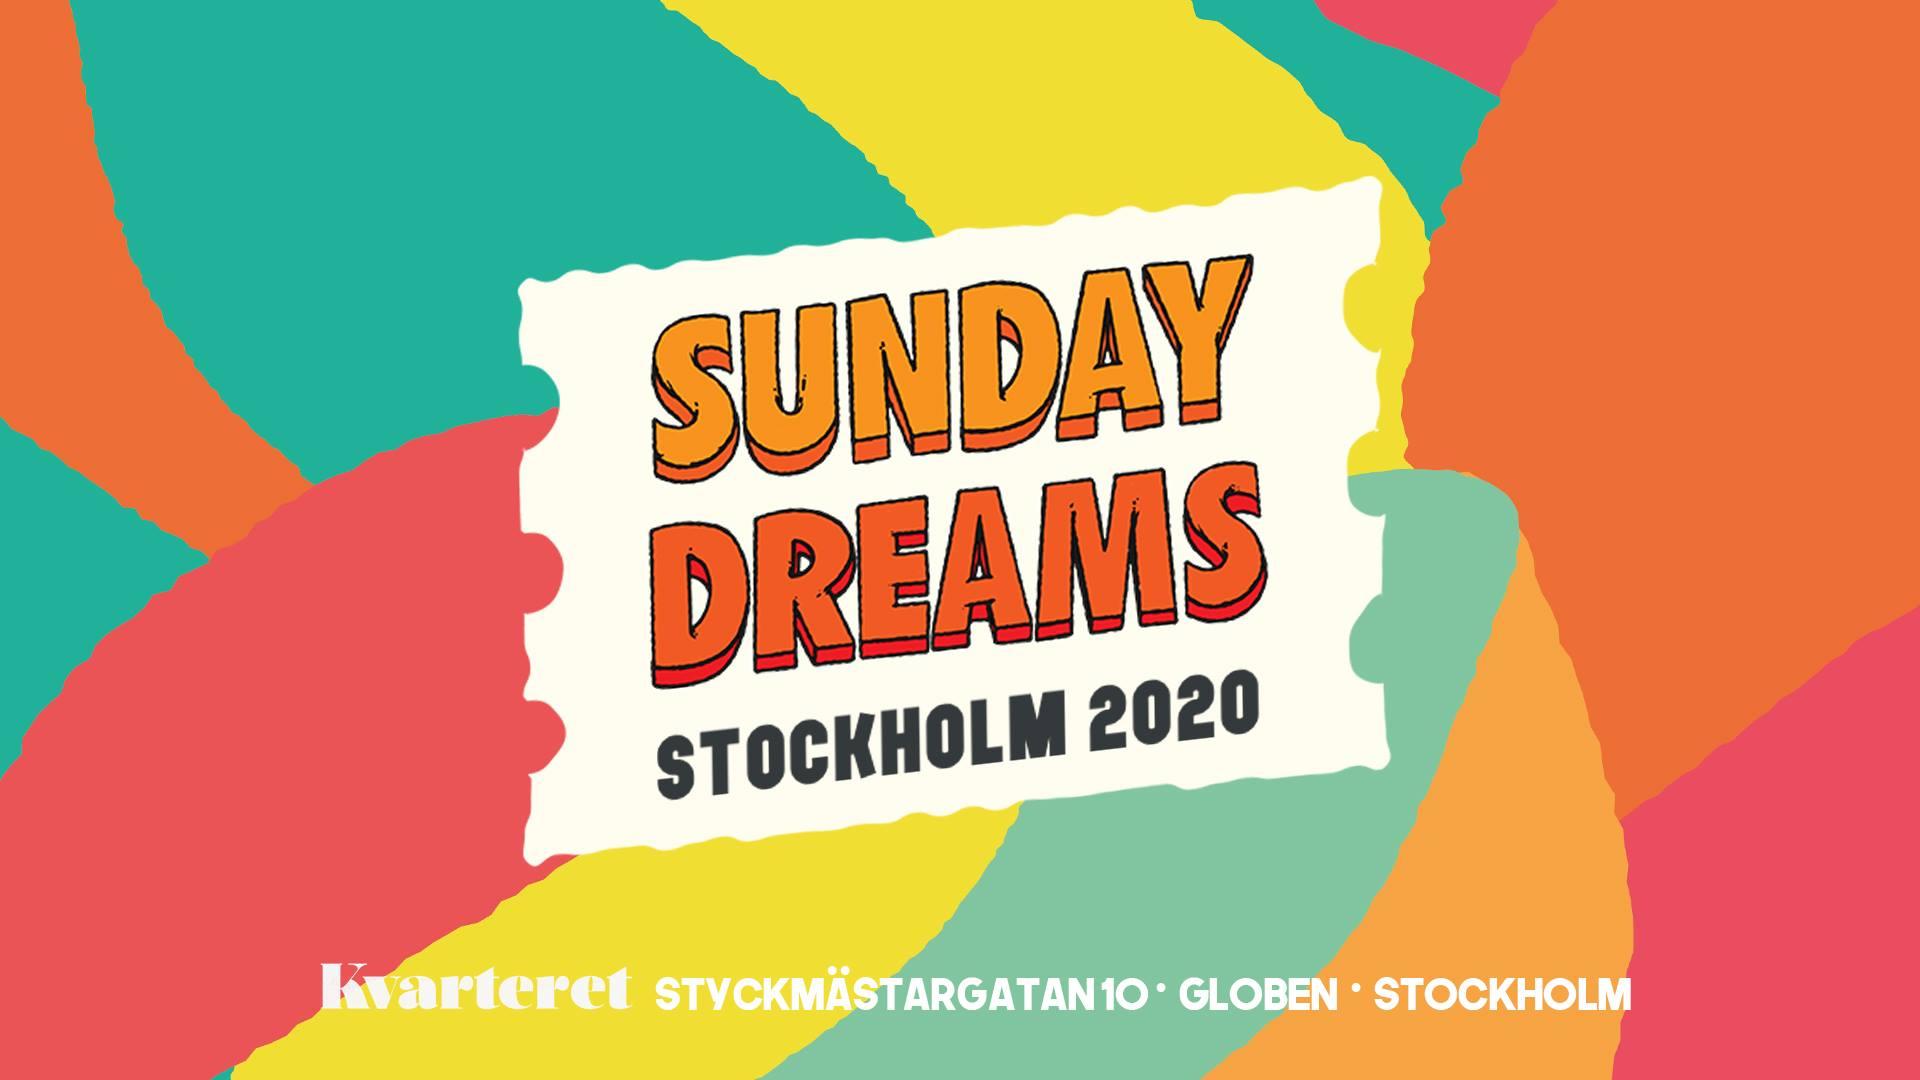 KLUBB: Sunday Dreams Sthlm 2020 - STOCKHOLM